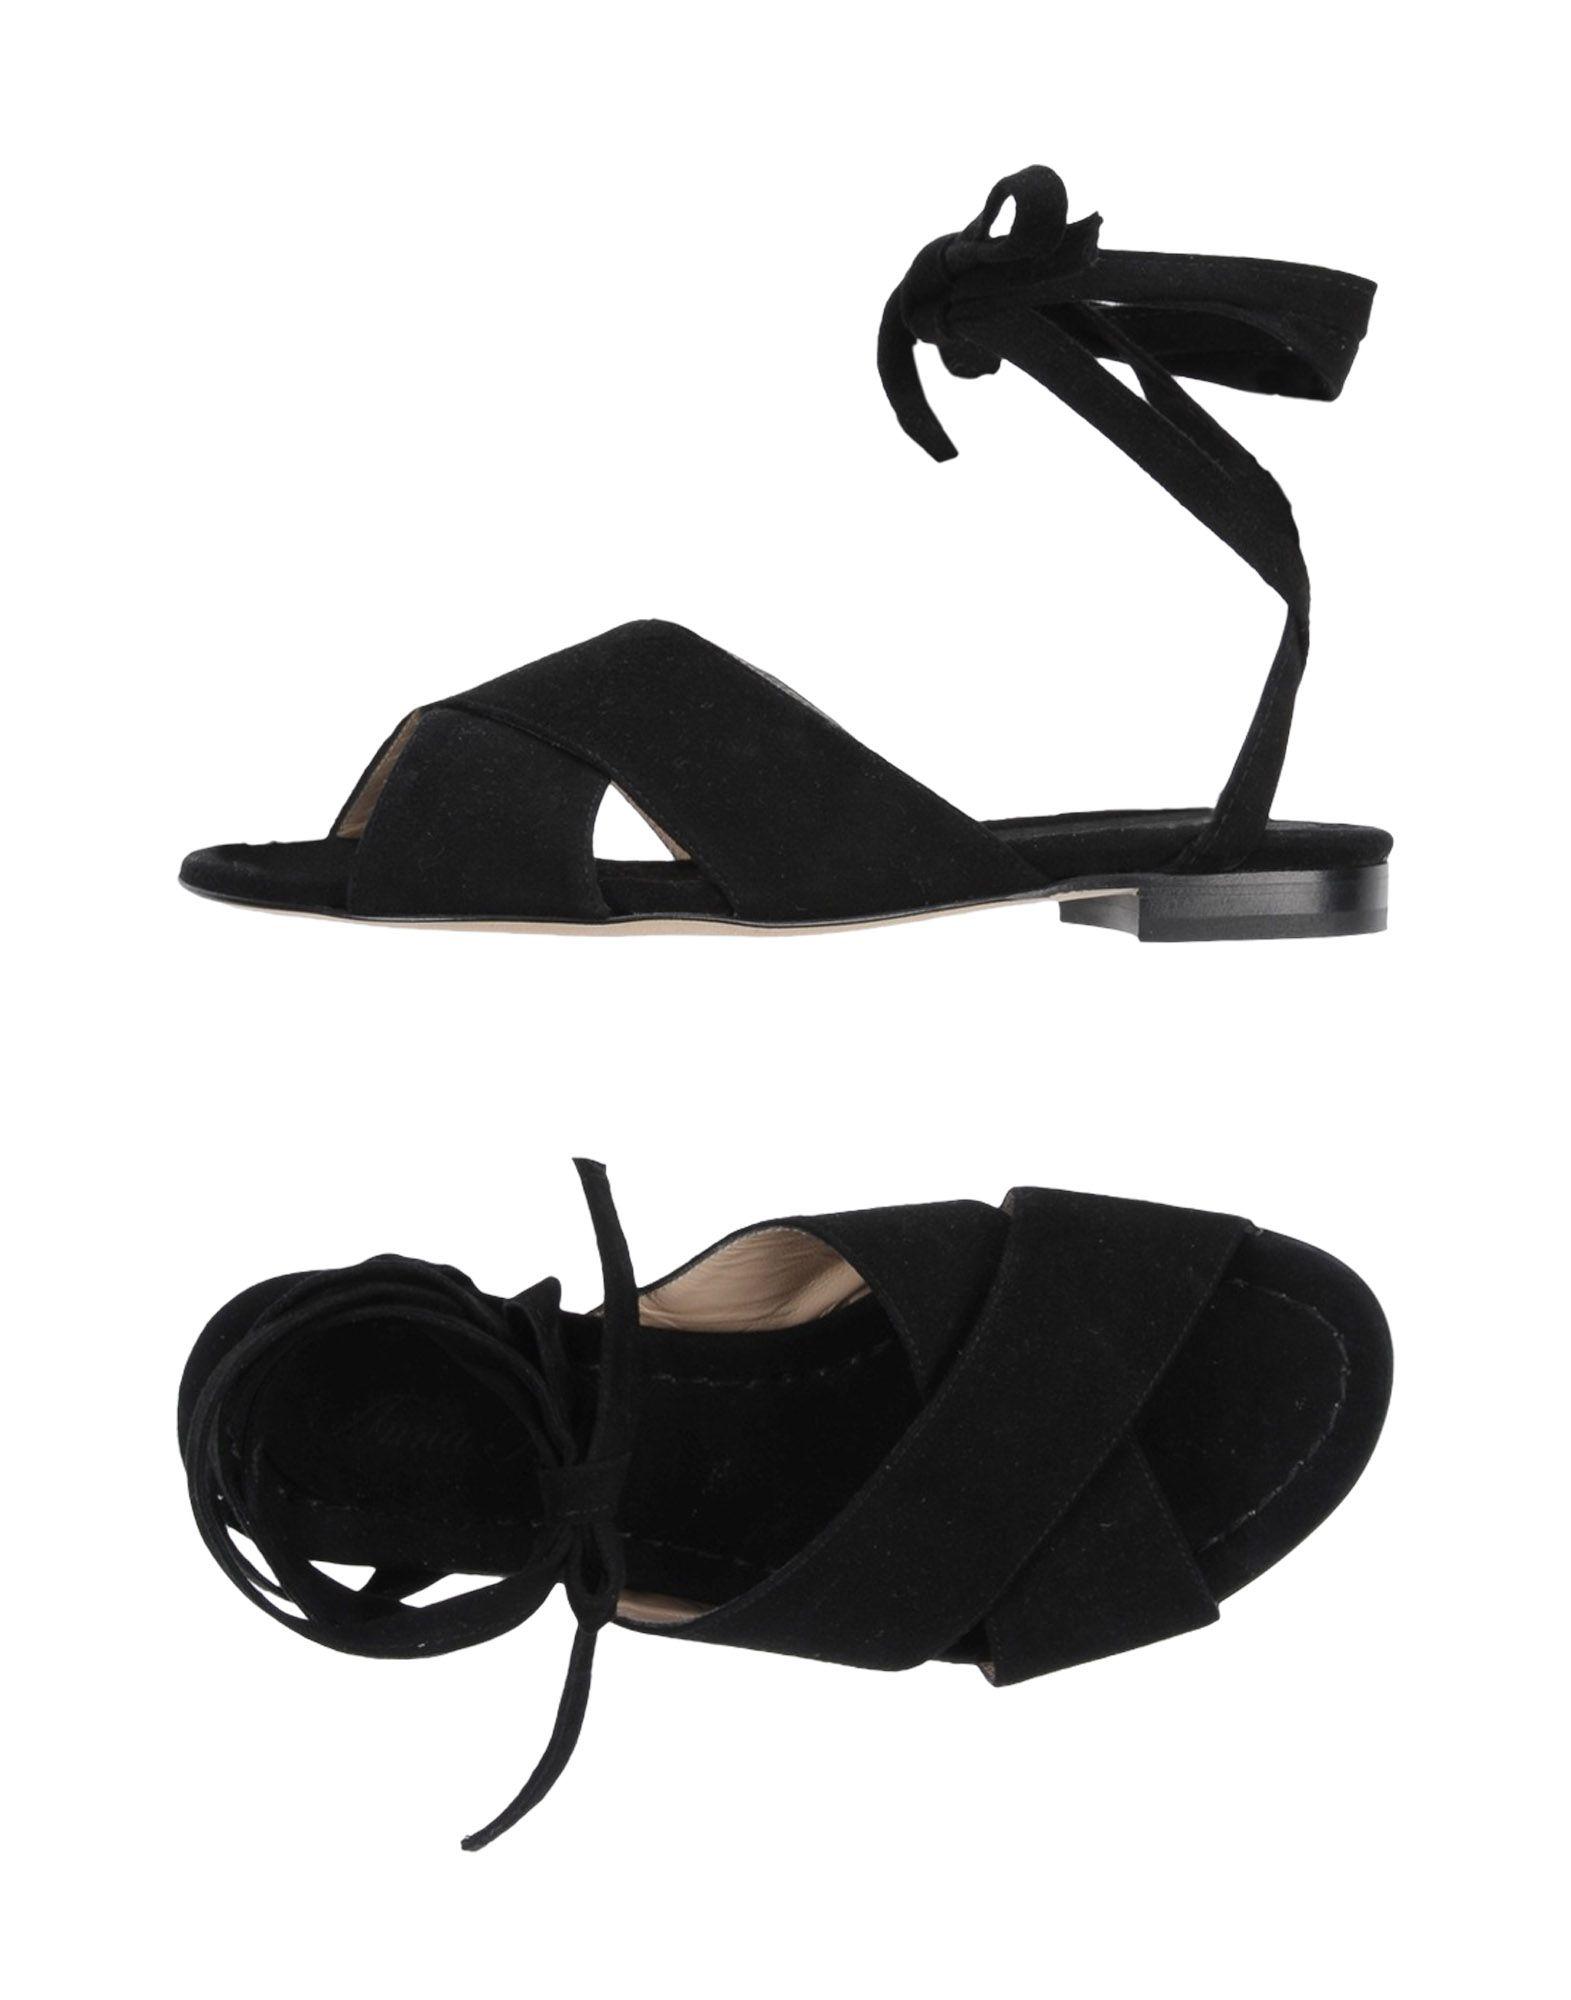 Anna F. Sandalen Damen  11434357WL Gute Qualität beliebte Schuhe